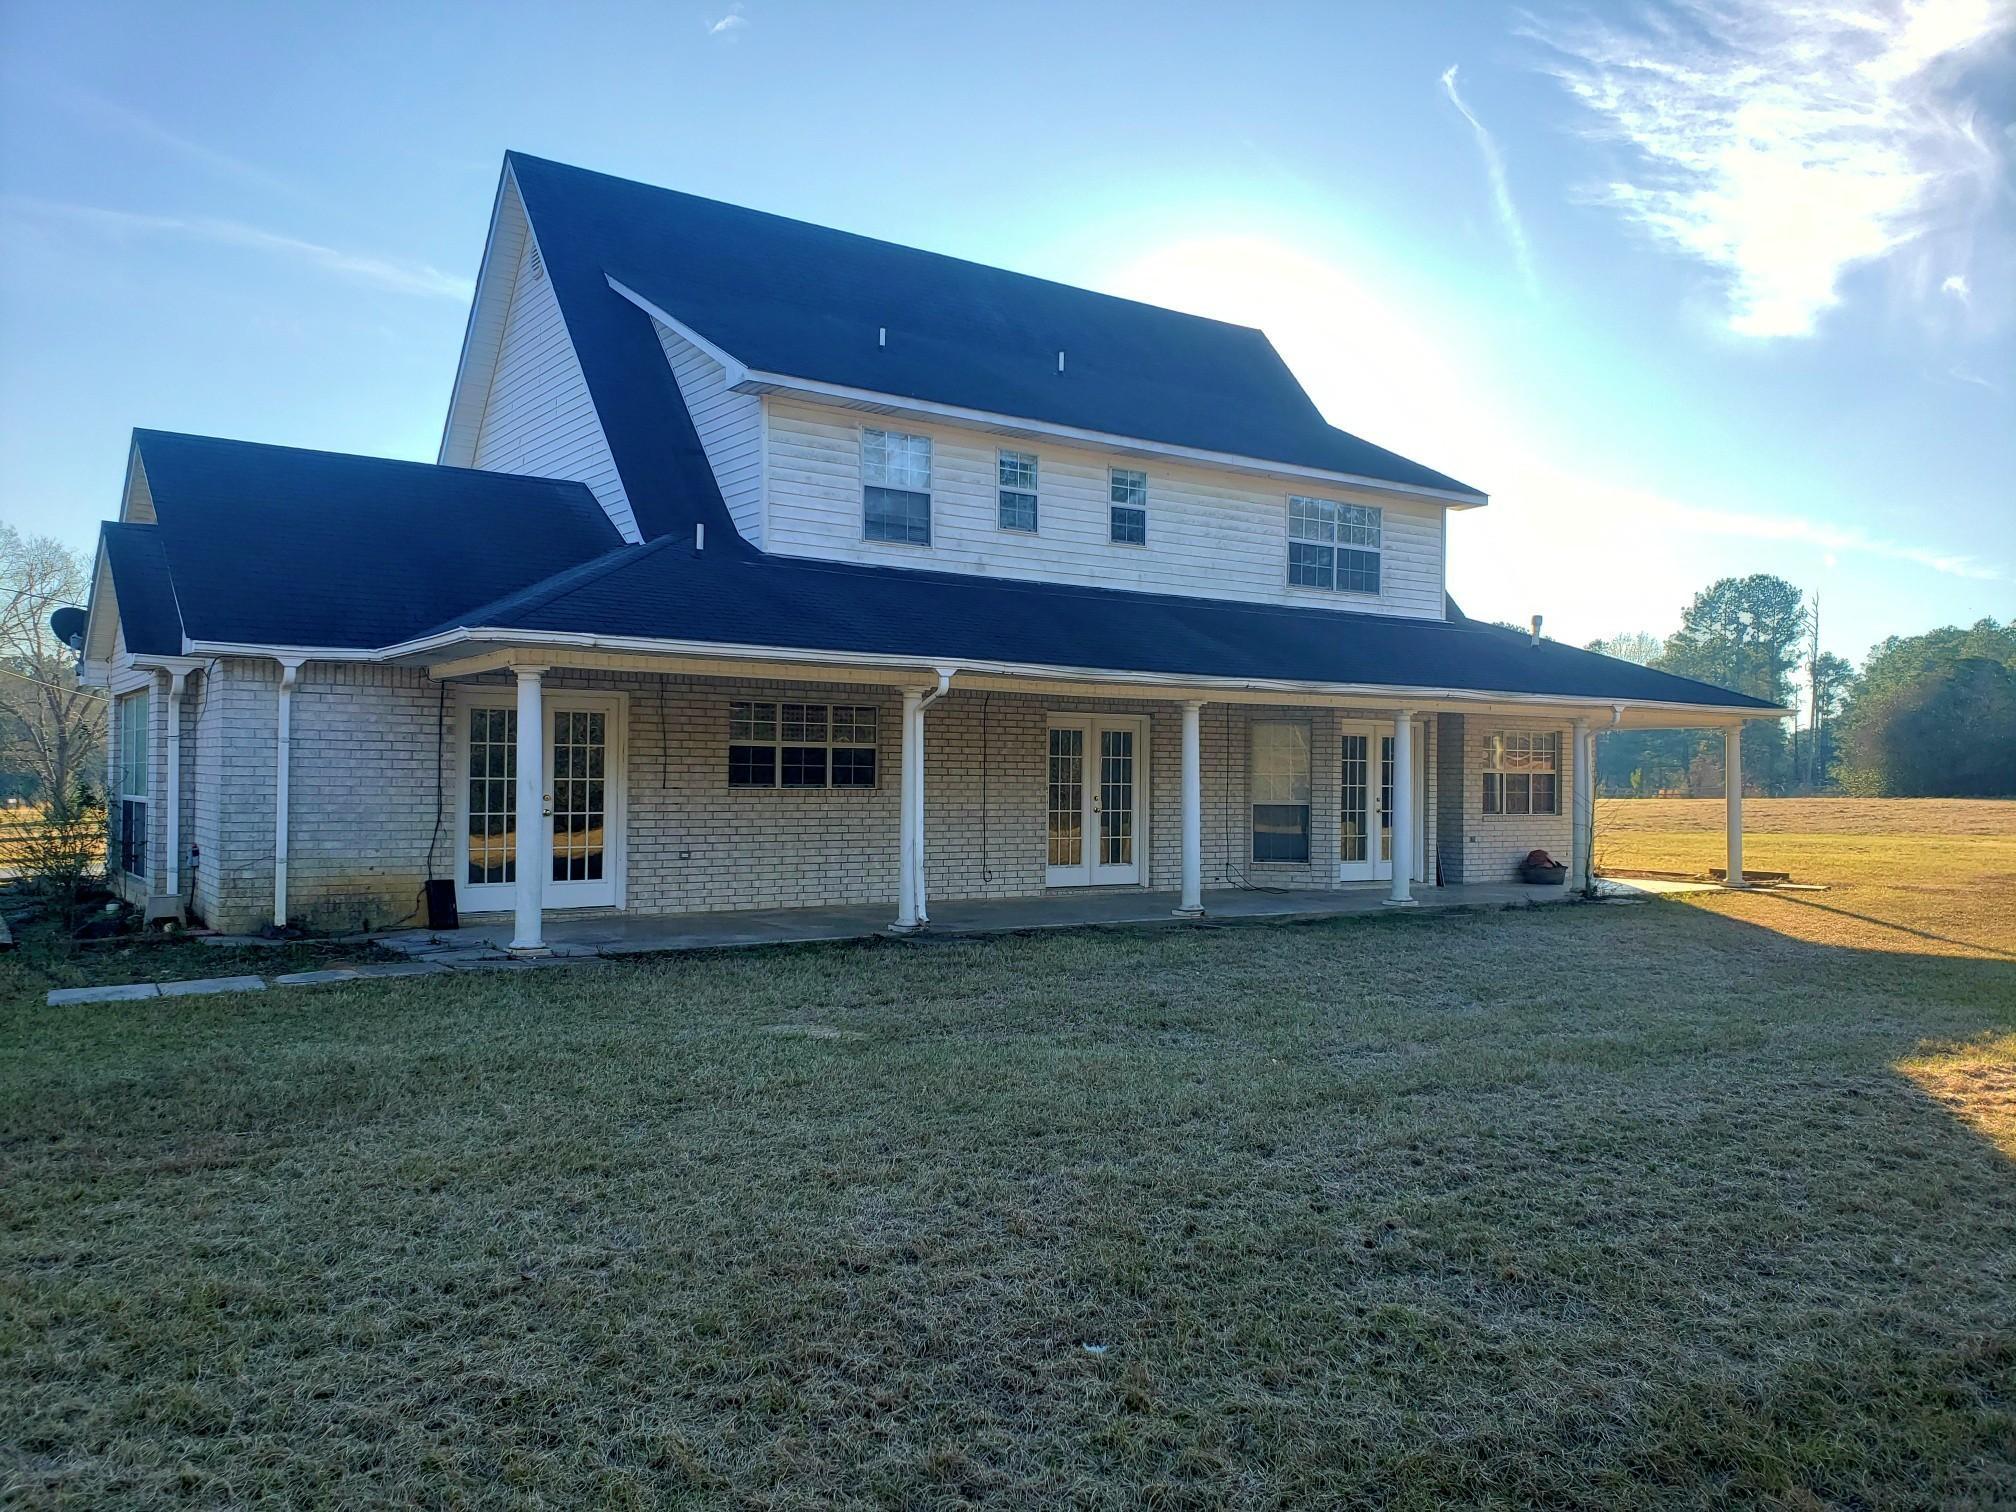 Leesville home for sale, 170 Ruby Haymond Road, Leesville LA - $330,000